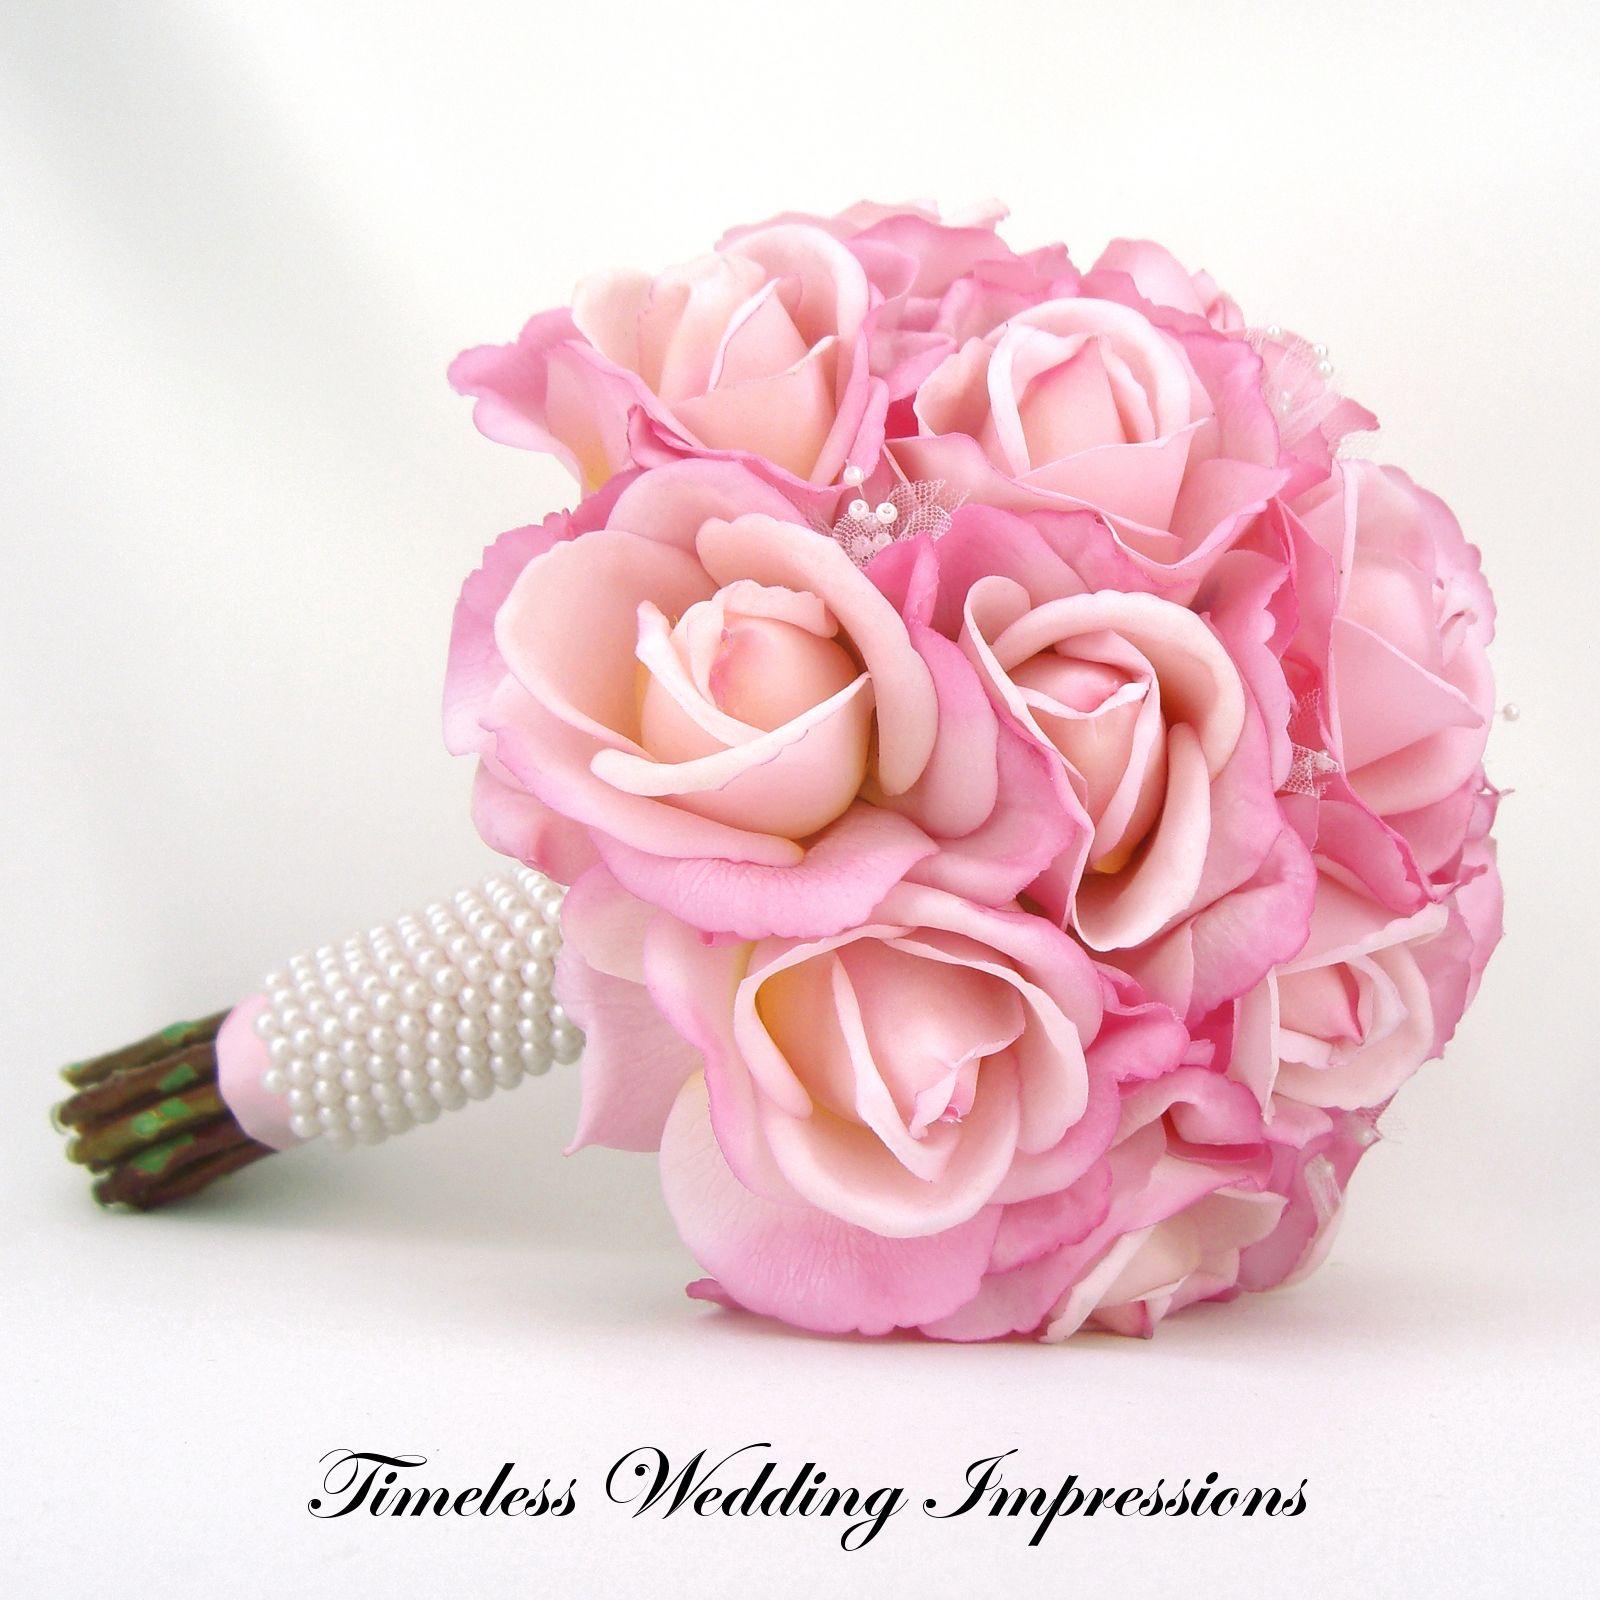 images of pink bridesmaids bouquets | Pink Rose Bridal Bouquet ...